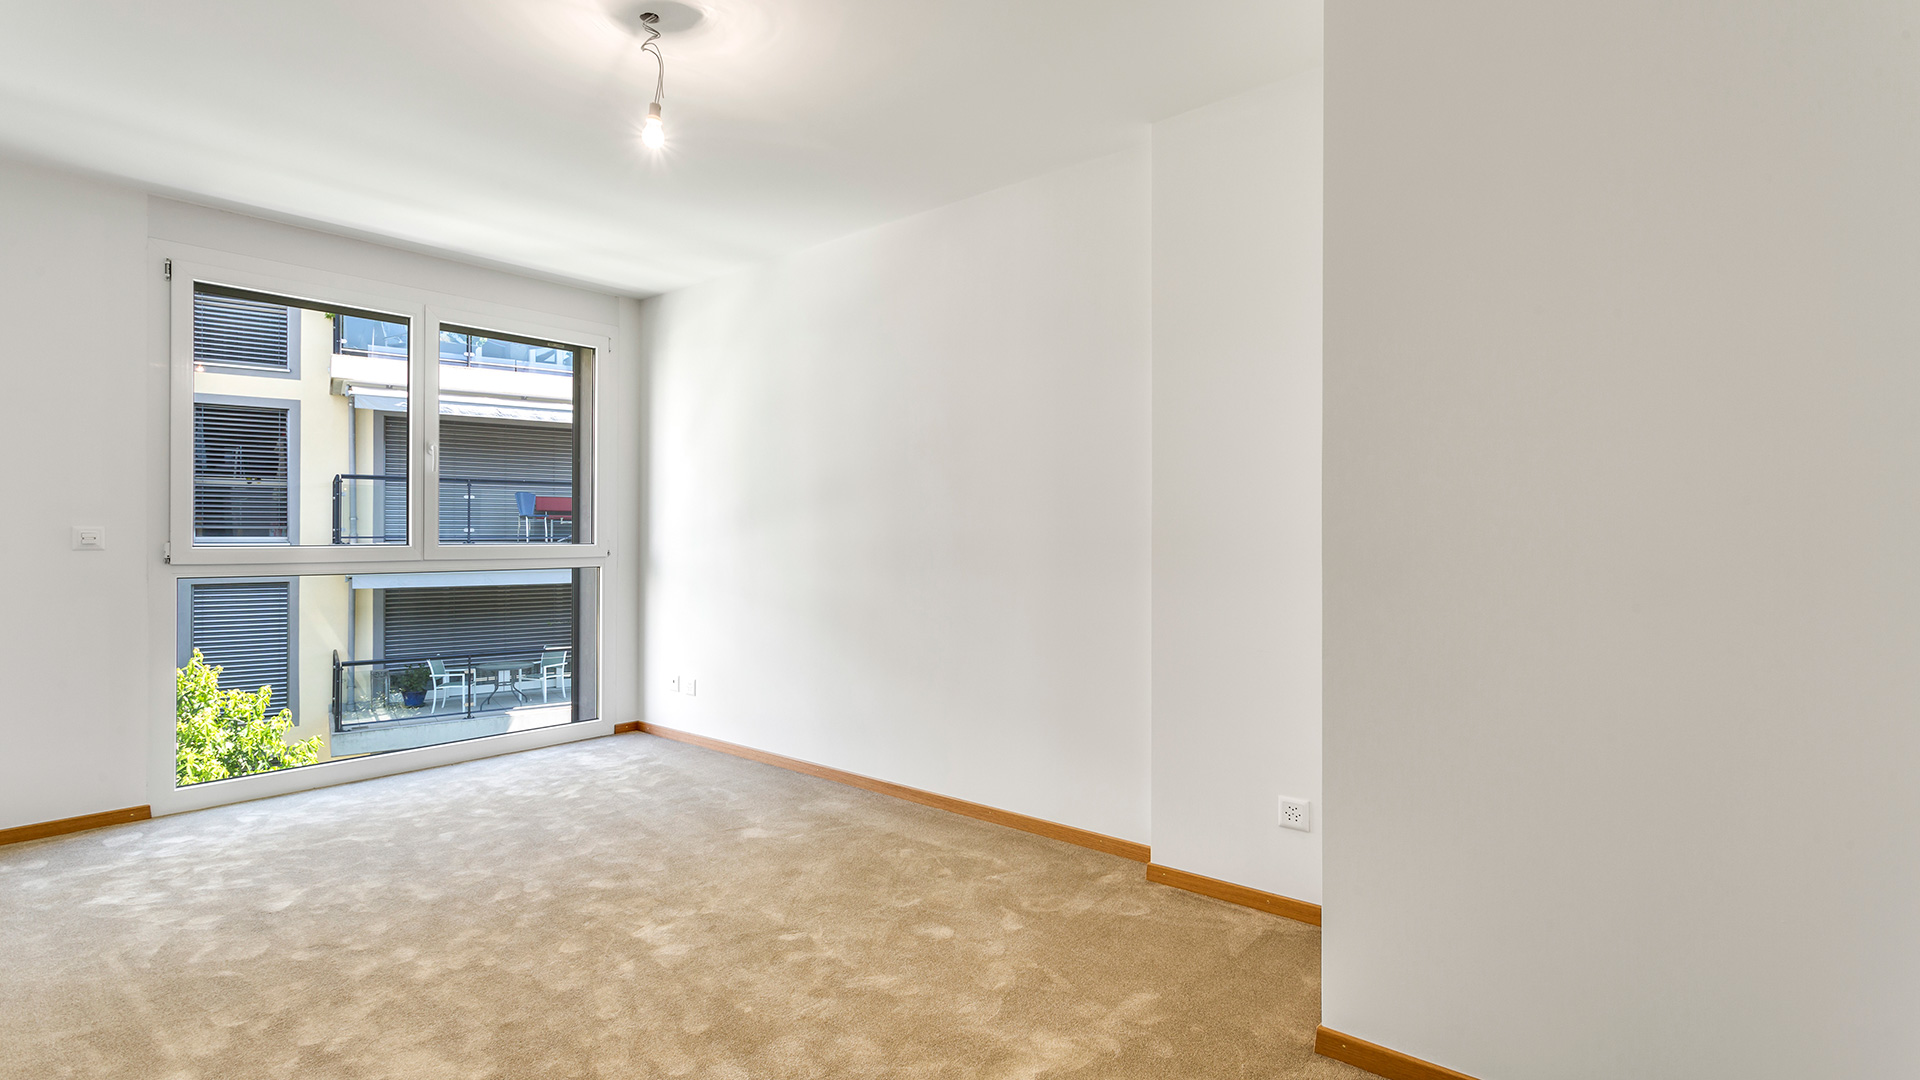 Le Grand 8 Apartments, Switzerland